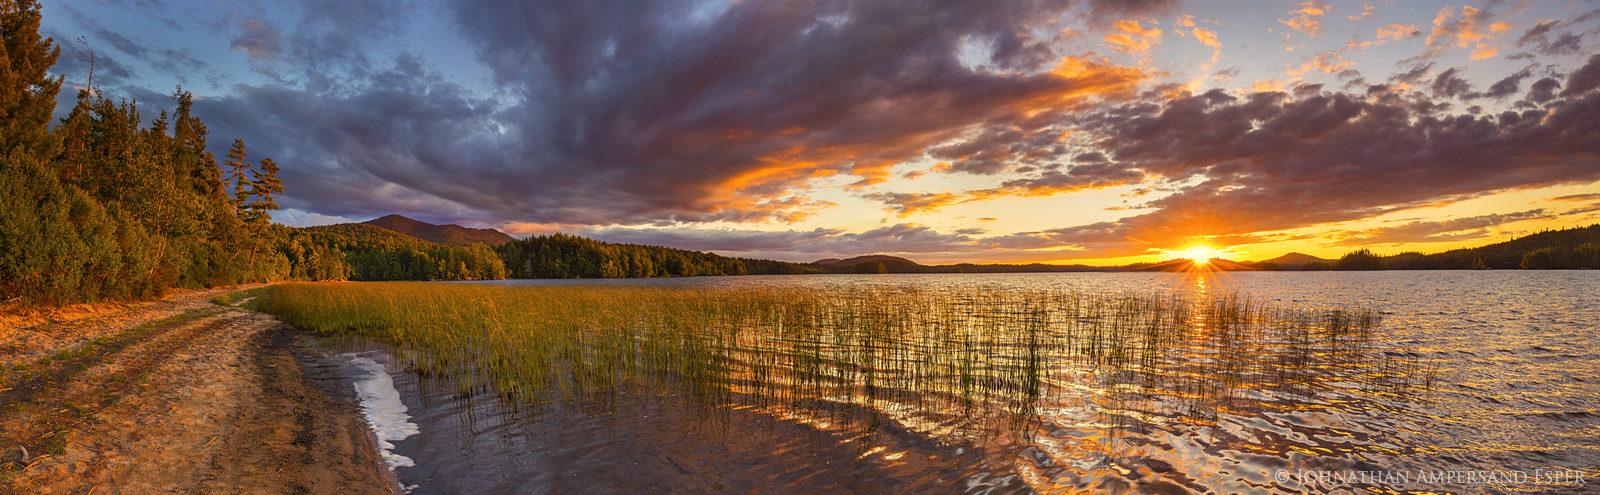 Middle Saranac Lake,Saranac Lake,summer sunset,summer,panorama,Ampersand,Ampersand Bay,Middle Saranac Lake,Saranac Lakes,